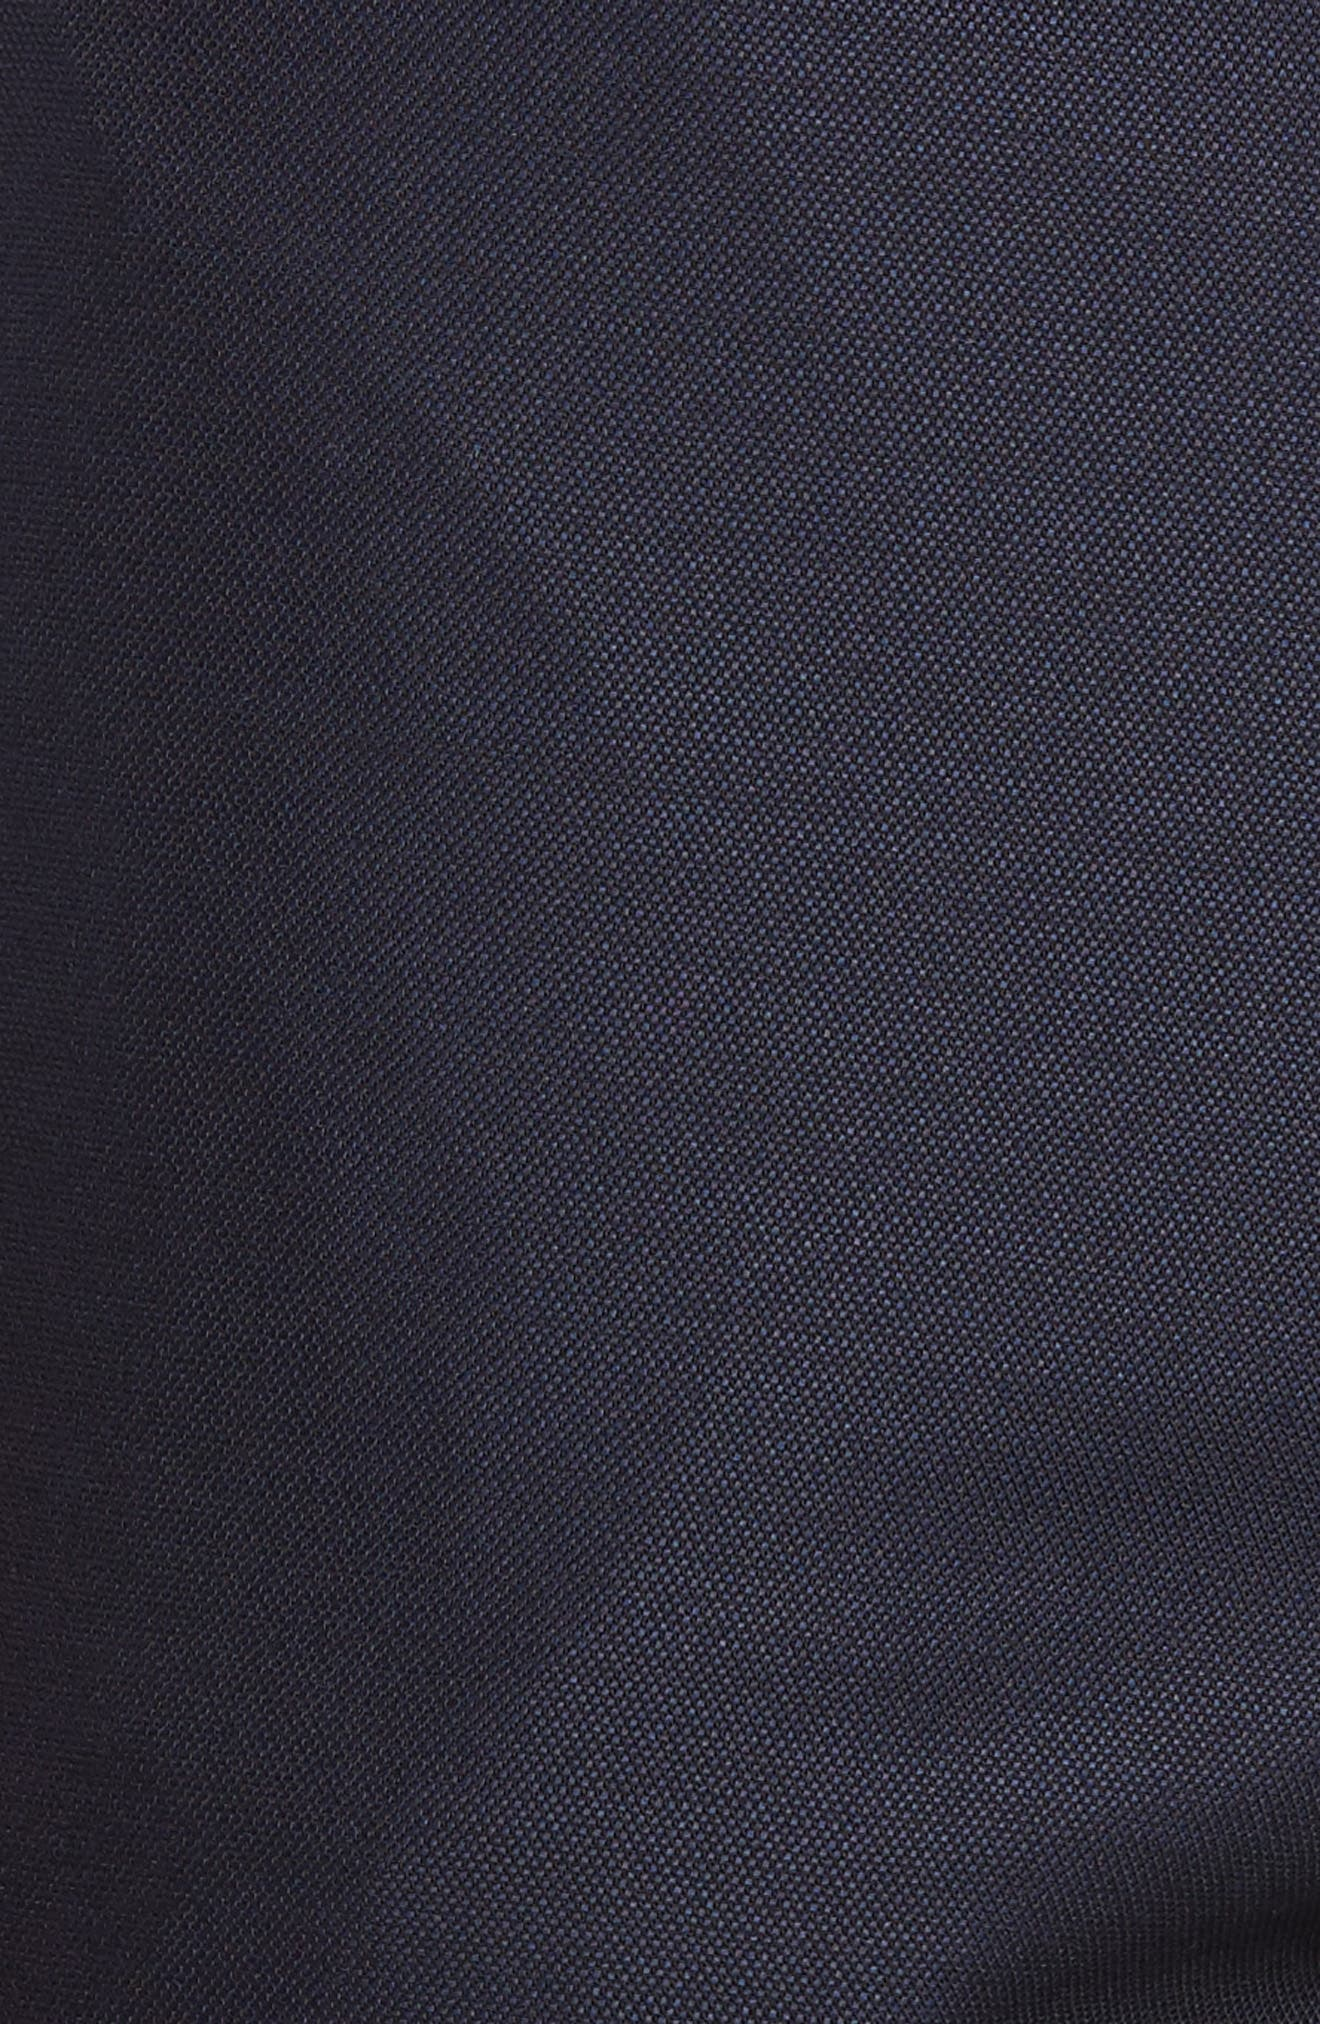 Pin Dot Wool Trousers,                             Alternate thumbnail 4, color,